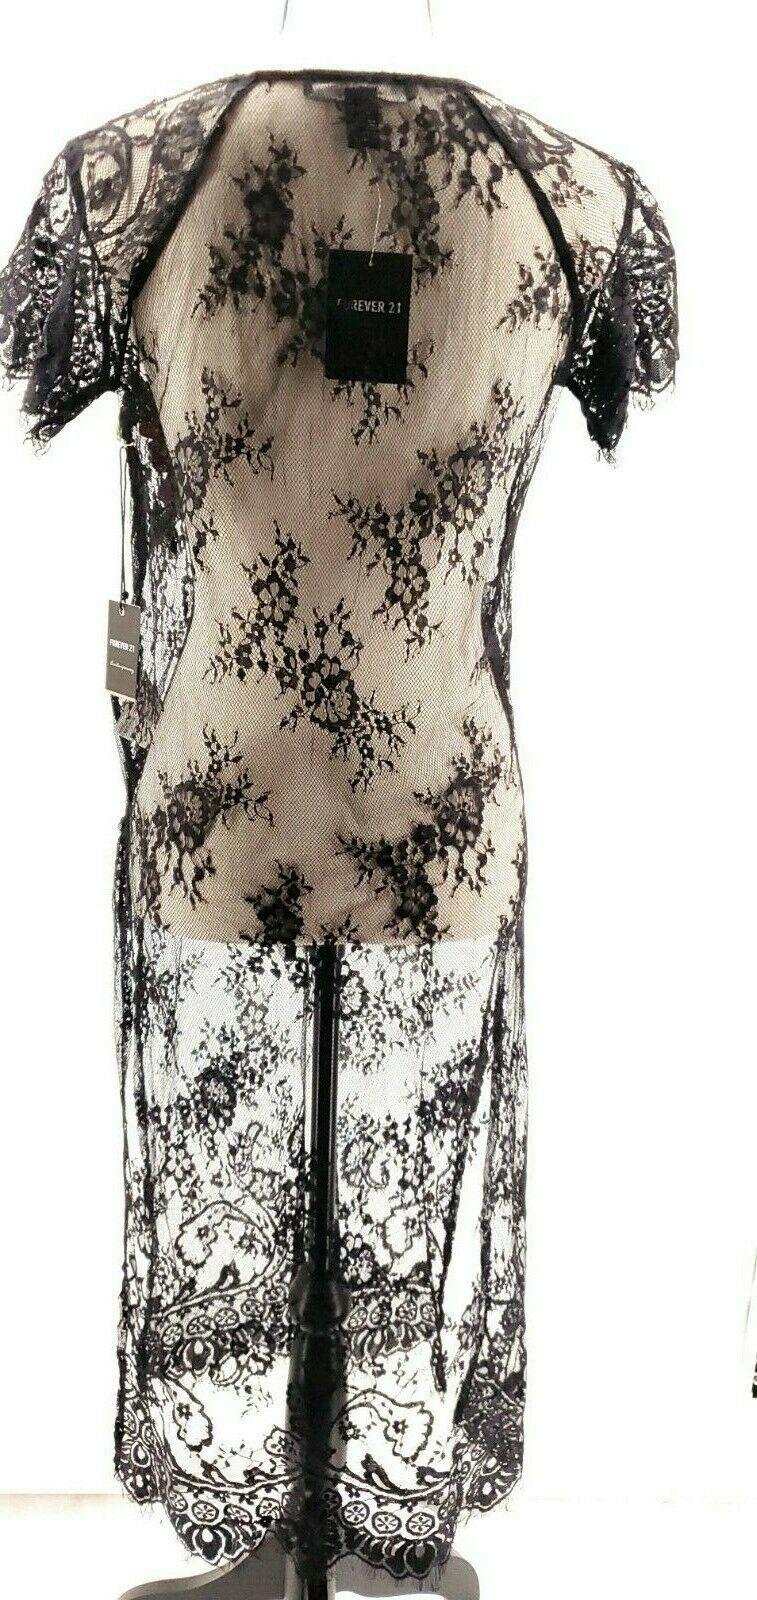 Forever 21 Black Contemporary Sheer Lace Dress/Cover Medium M